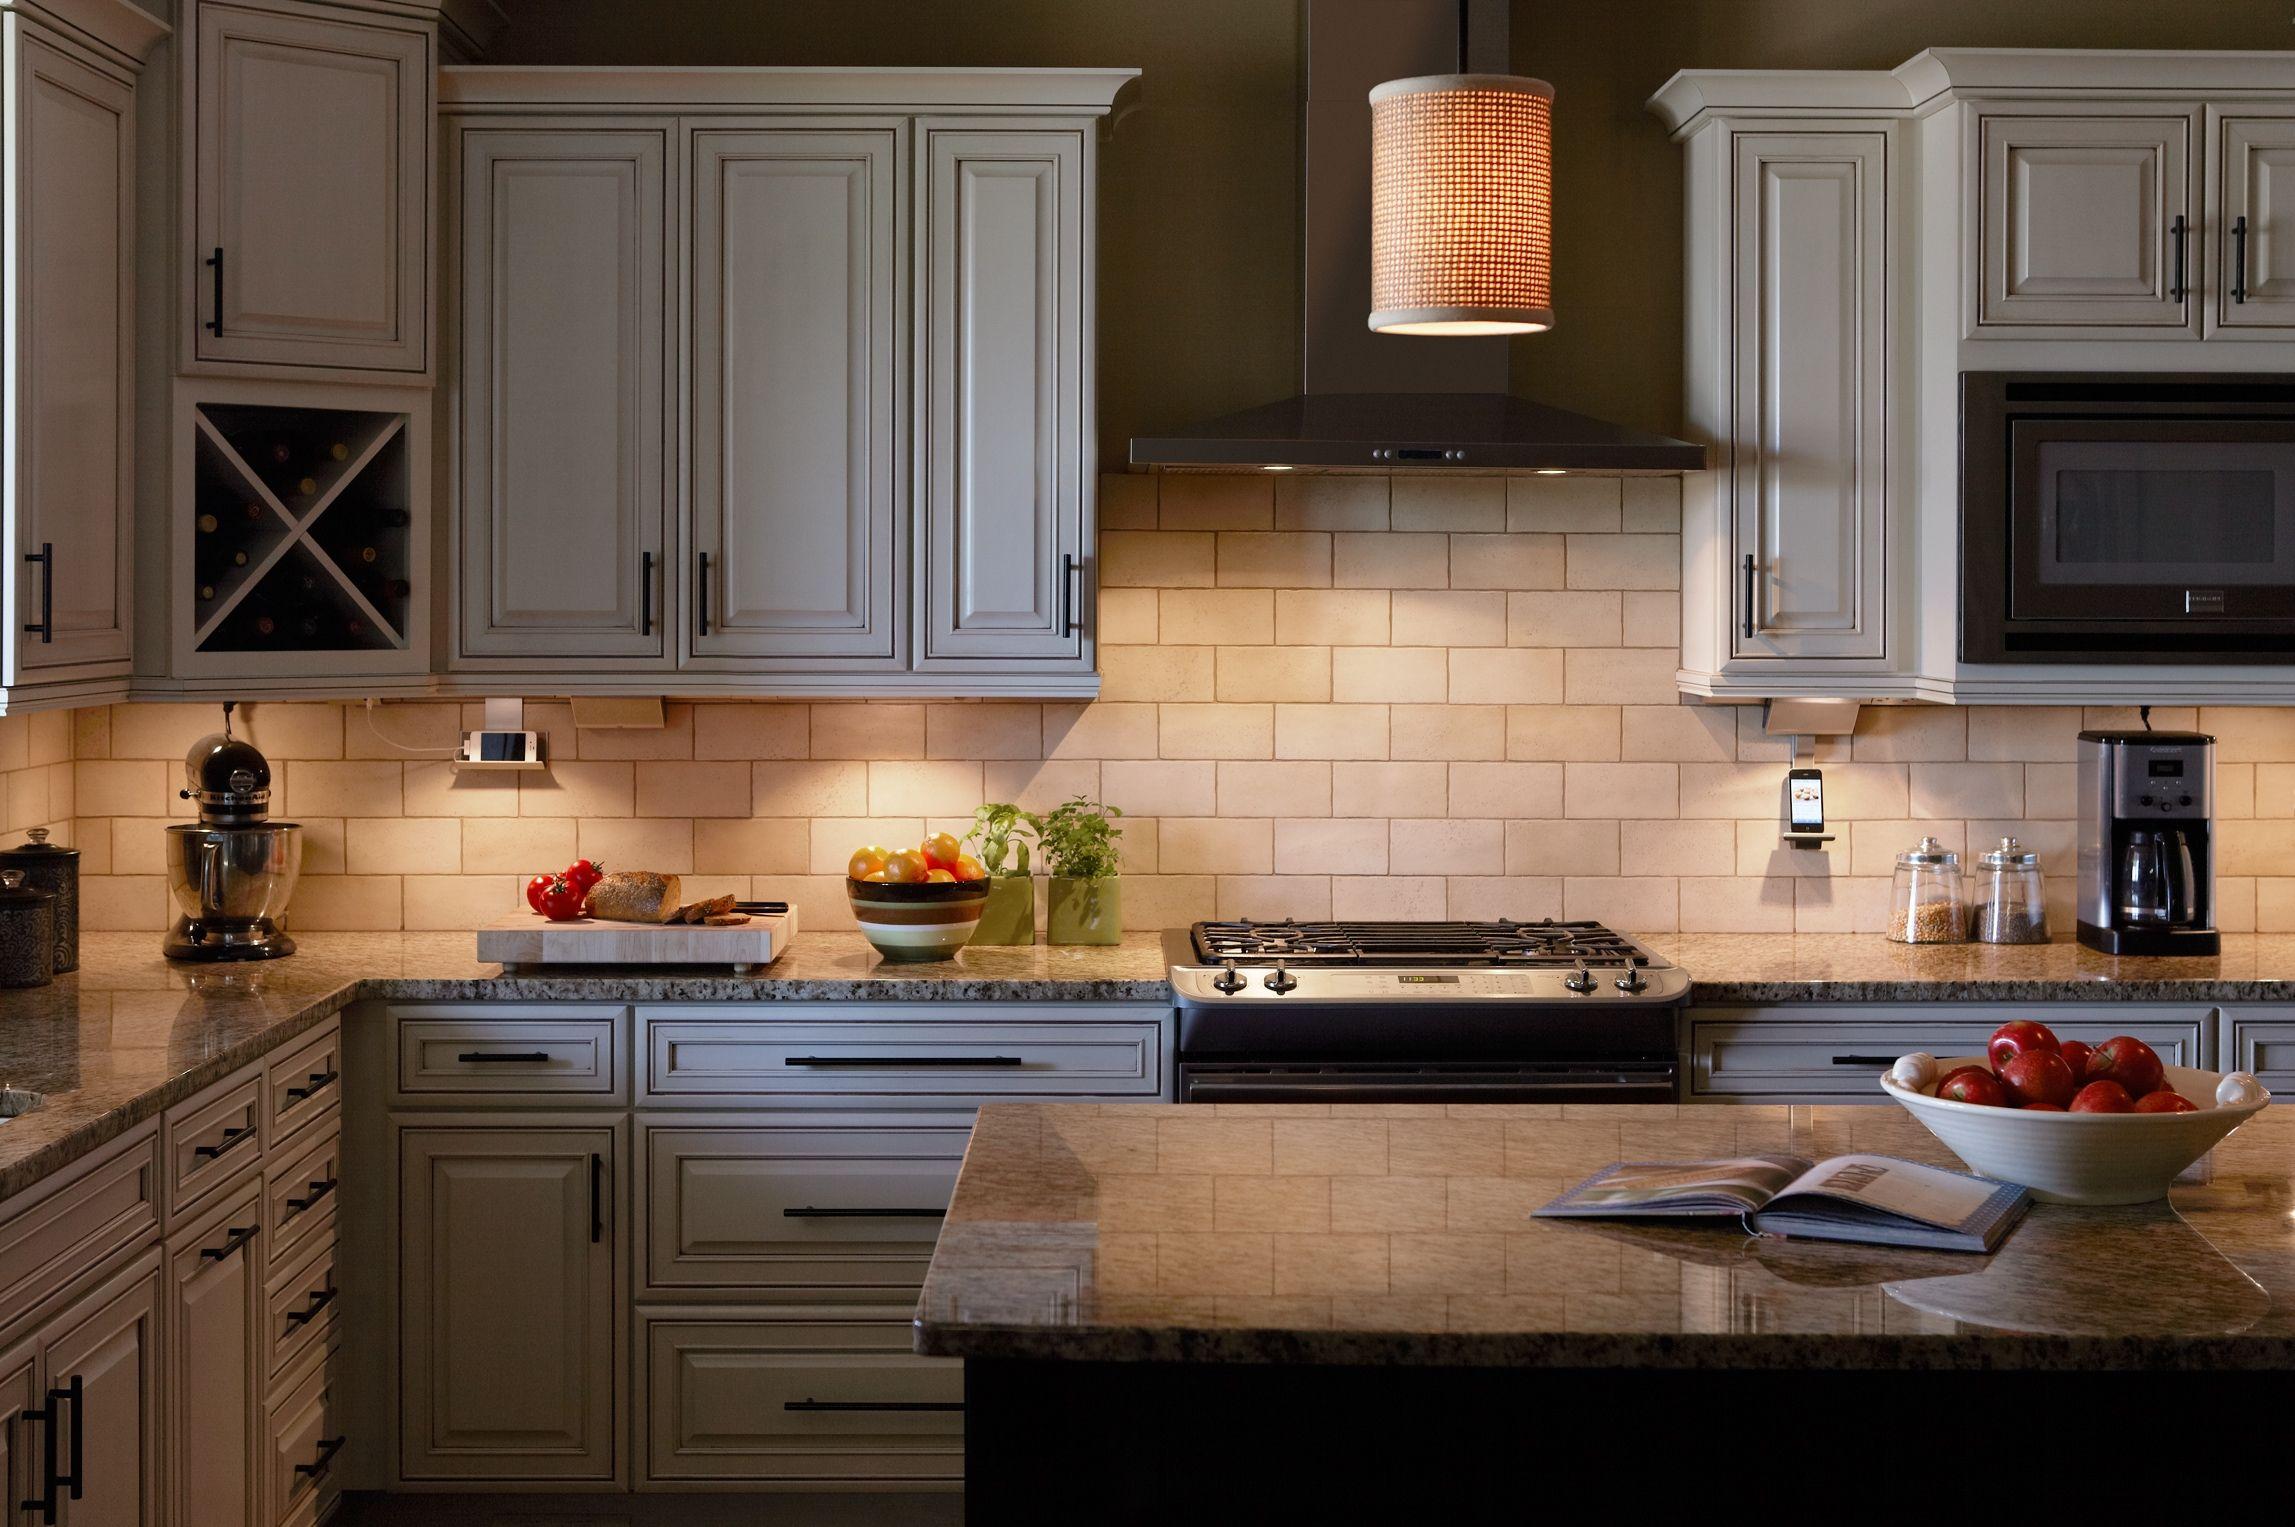 Wickes Kitchen Under Cabinet Lighting • Patio Ideas